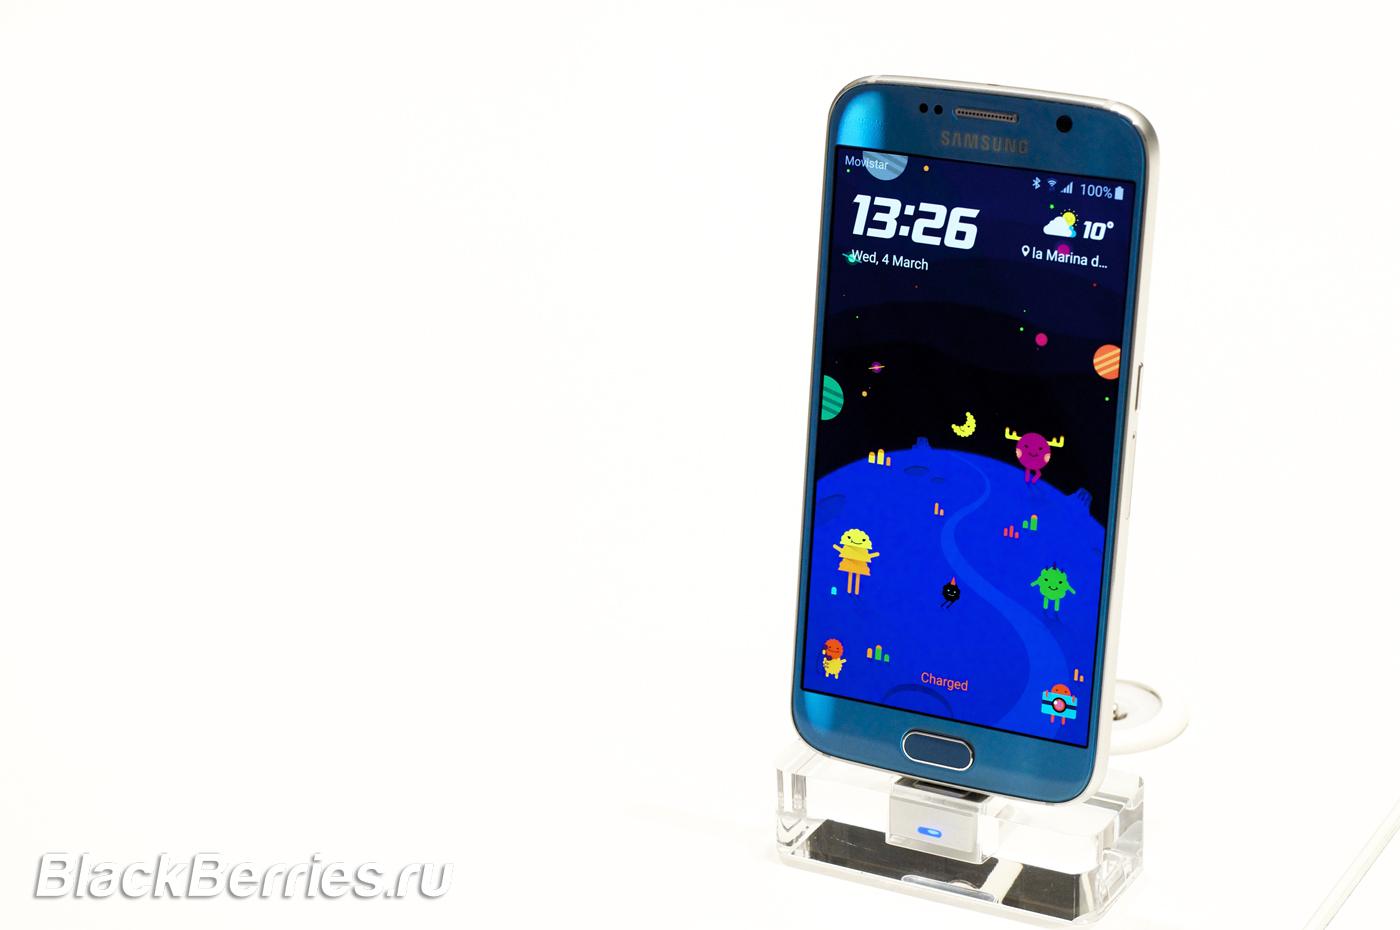 Samsung-S6-edge-MWC2015-24